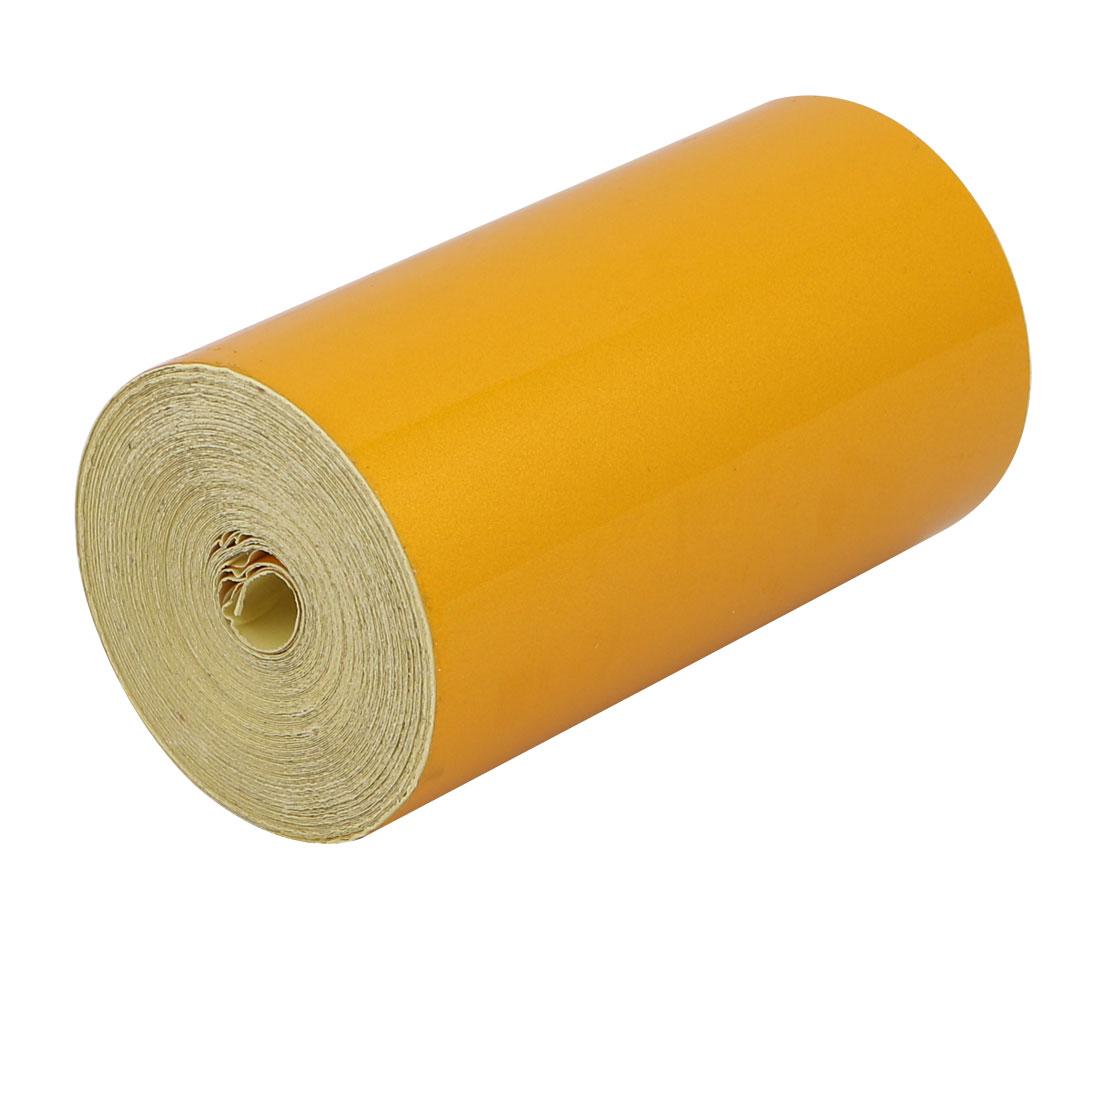 10M Length 10cm Width Single Sided Adhesive Reflective Warning Tape Tilt Yellow